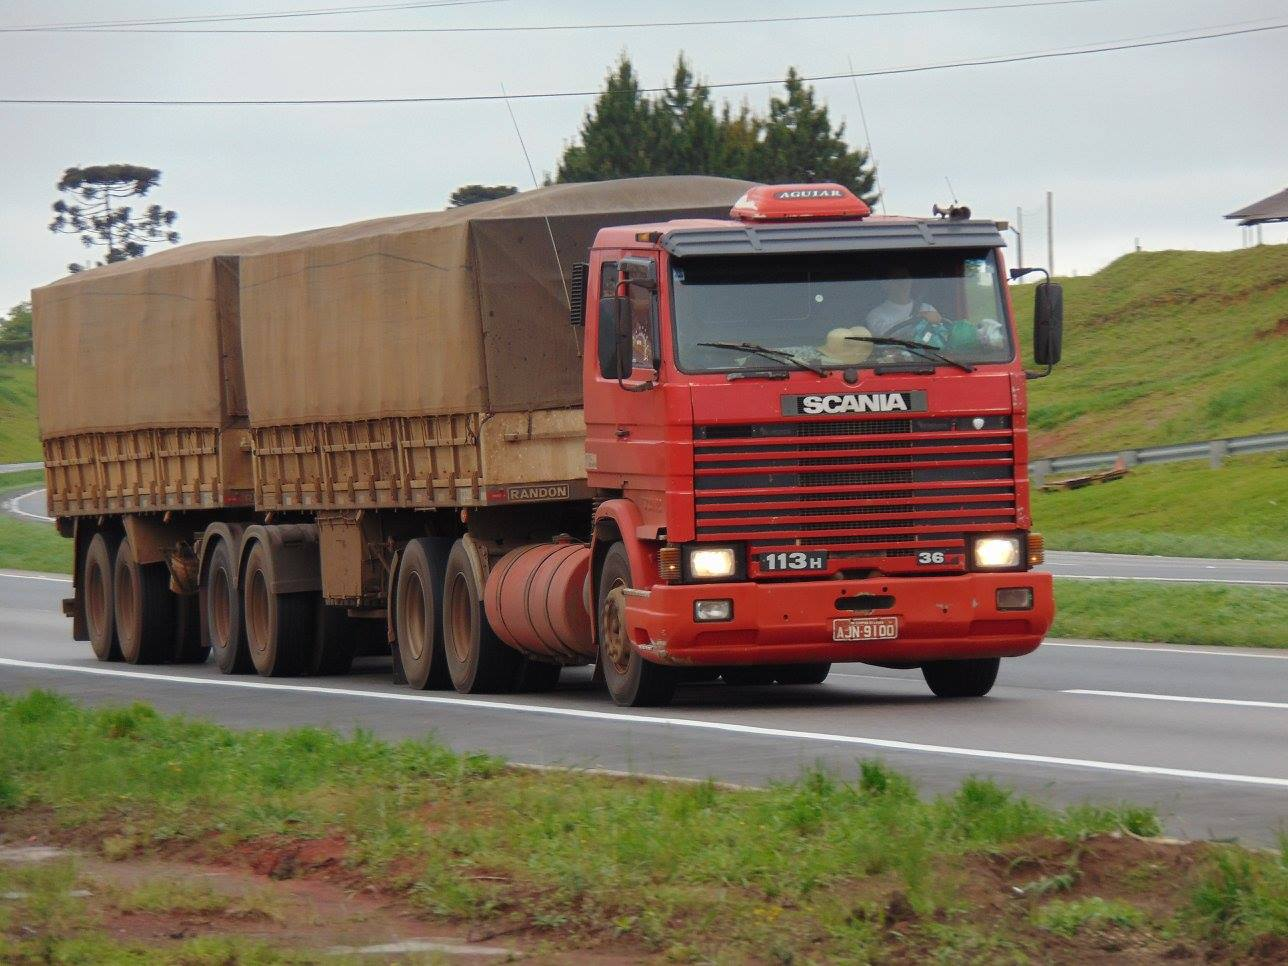 Scania-photo-5-1--2015-25